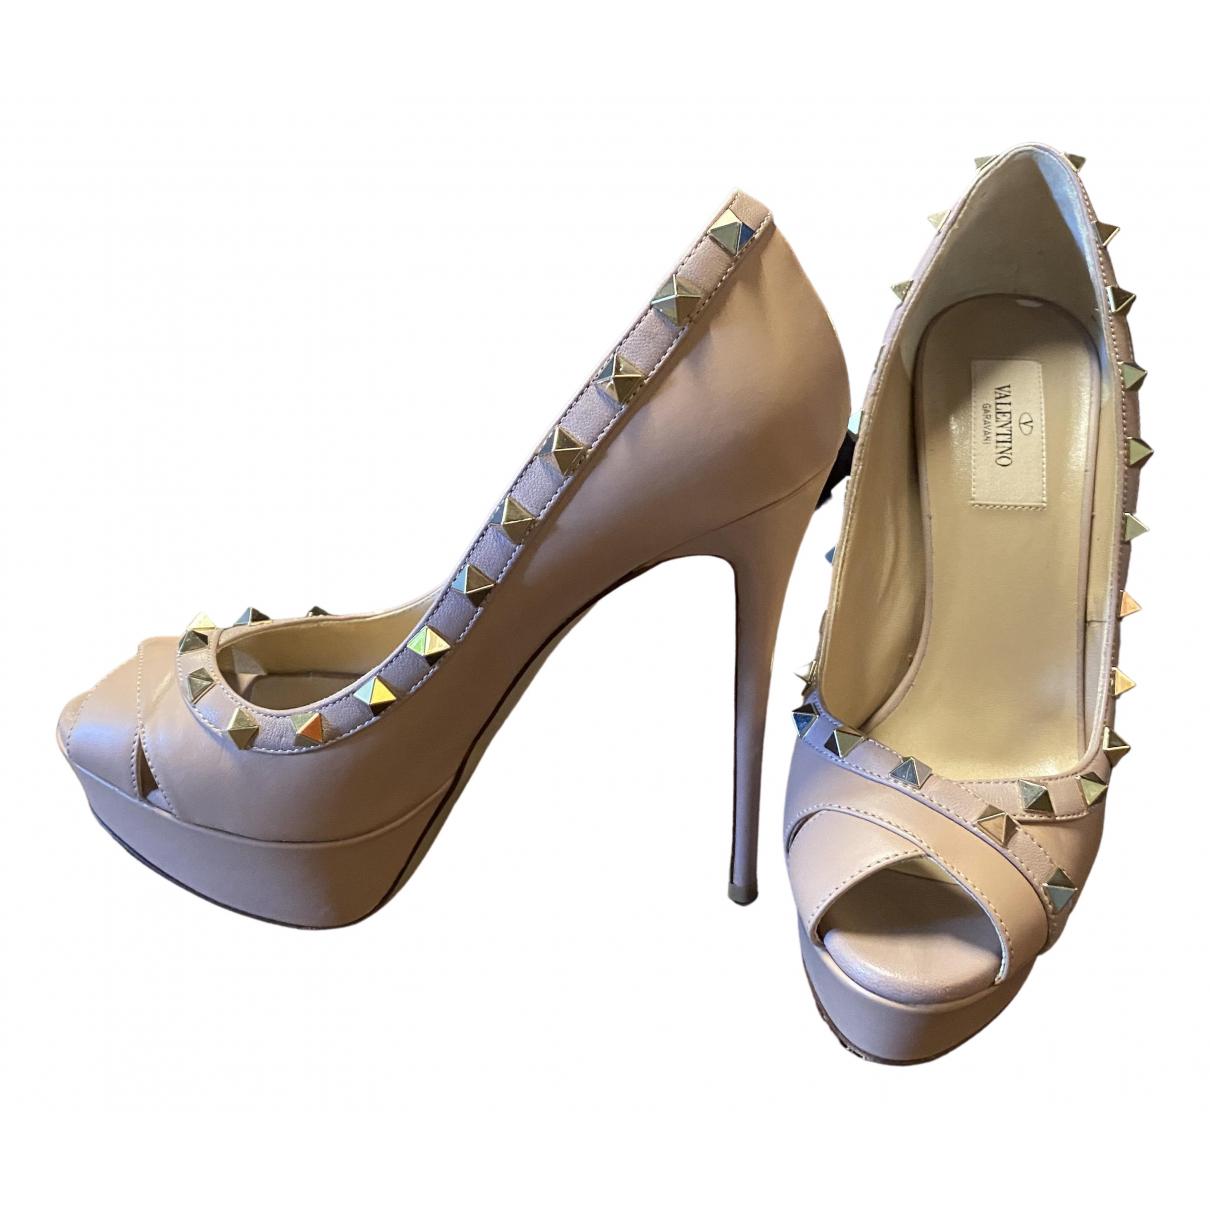 Valentino Garavani Rockstud Beige Leather Heels for Women 38.5 EU